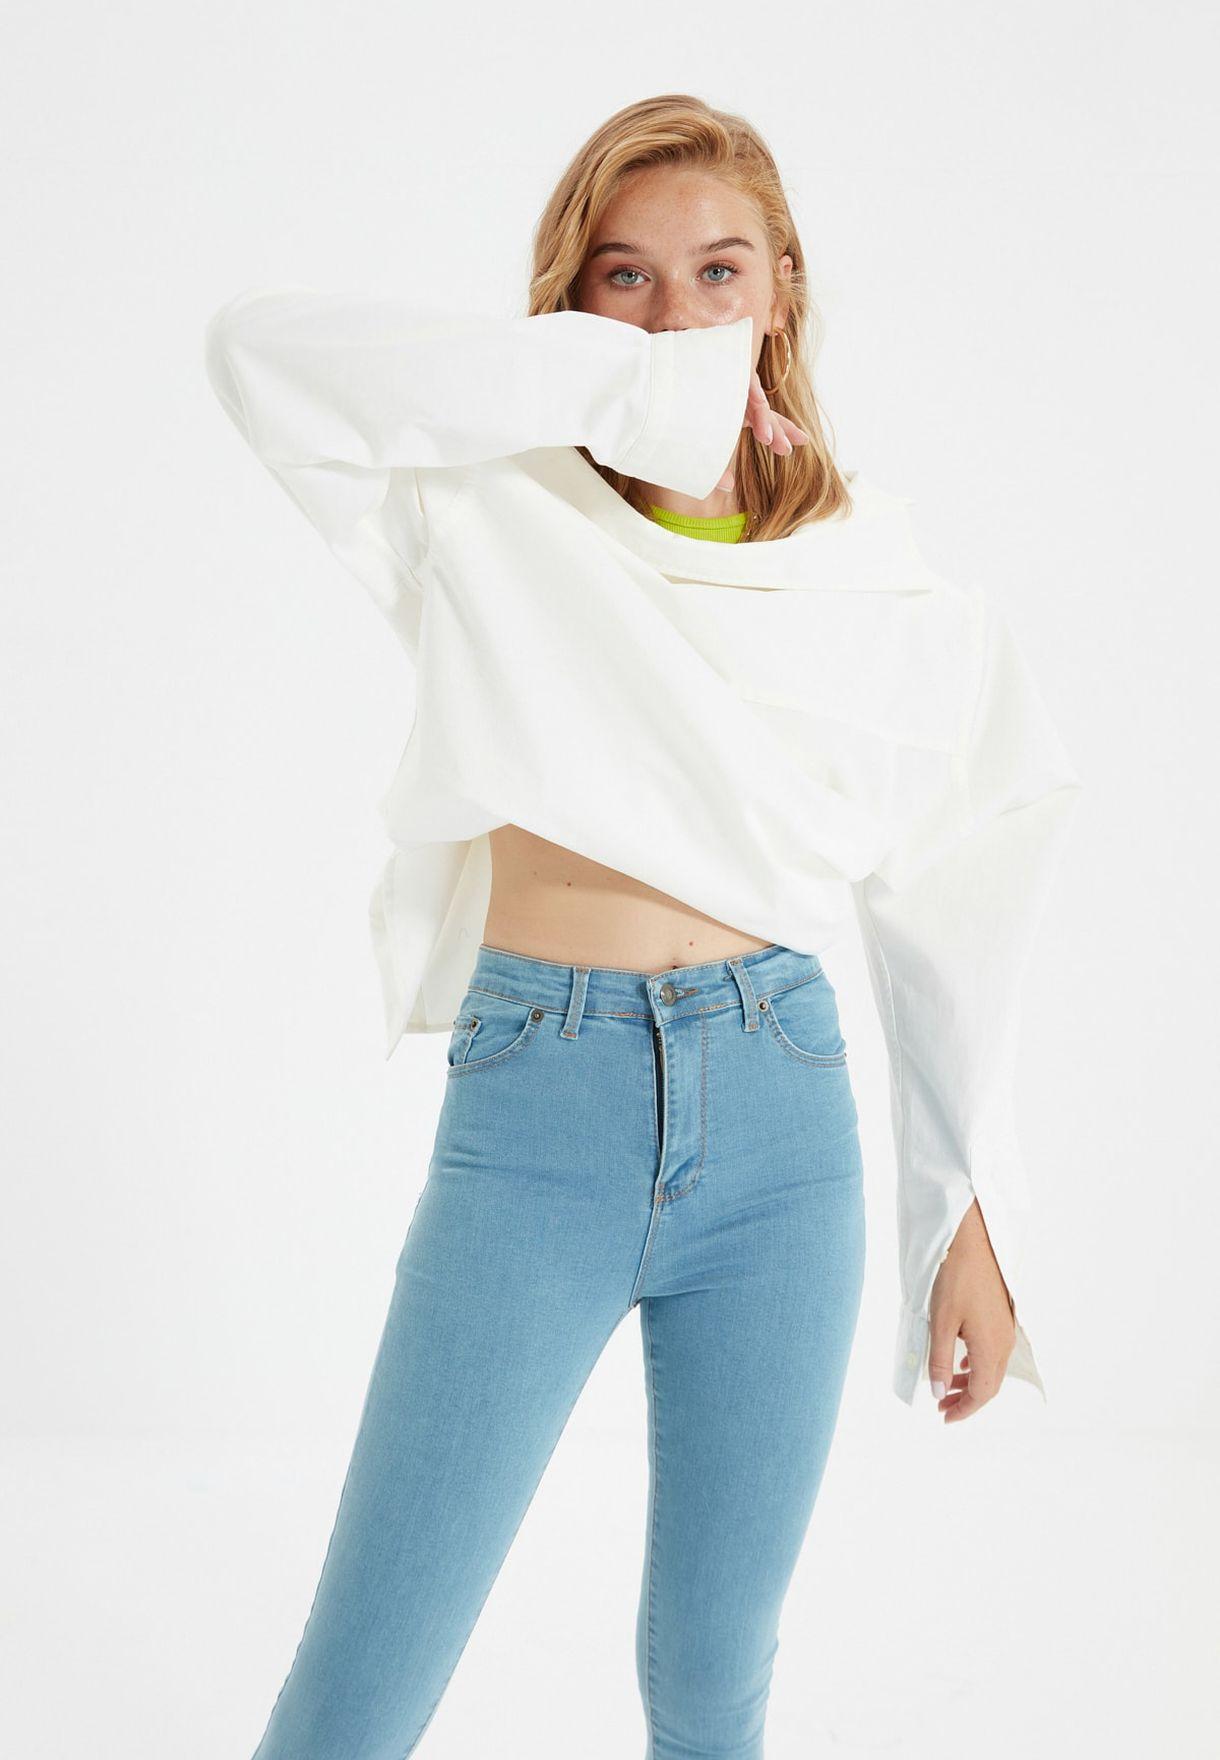 جينز سكيني بخصر عالي